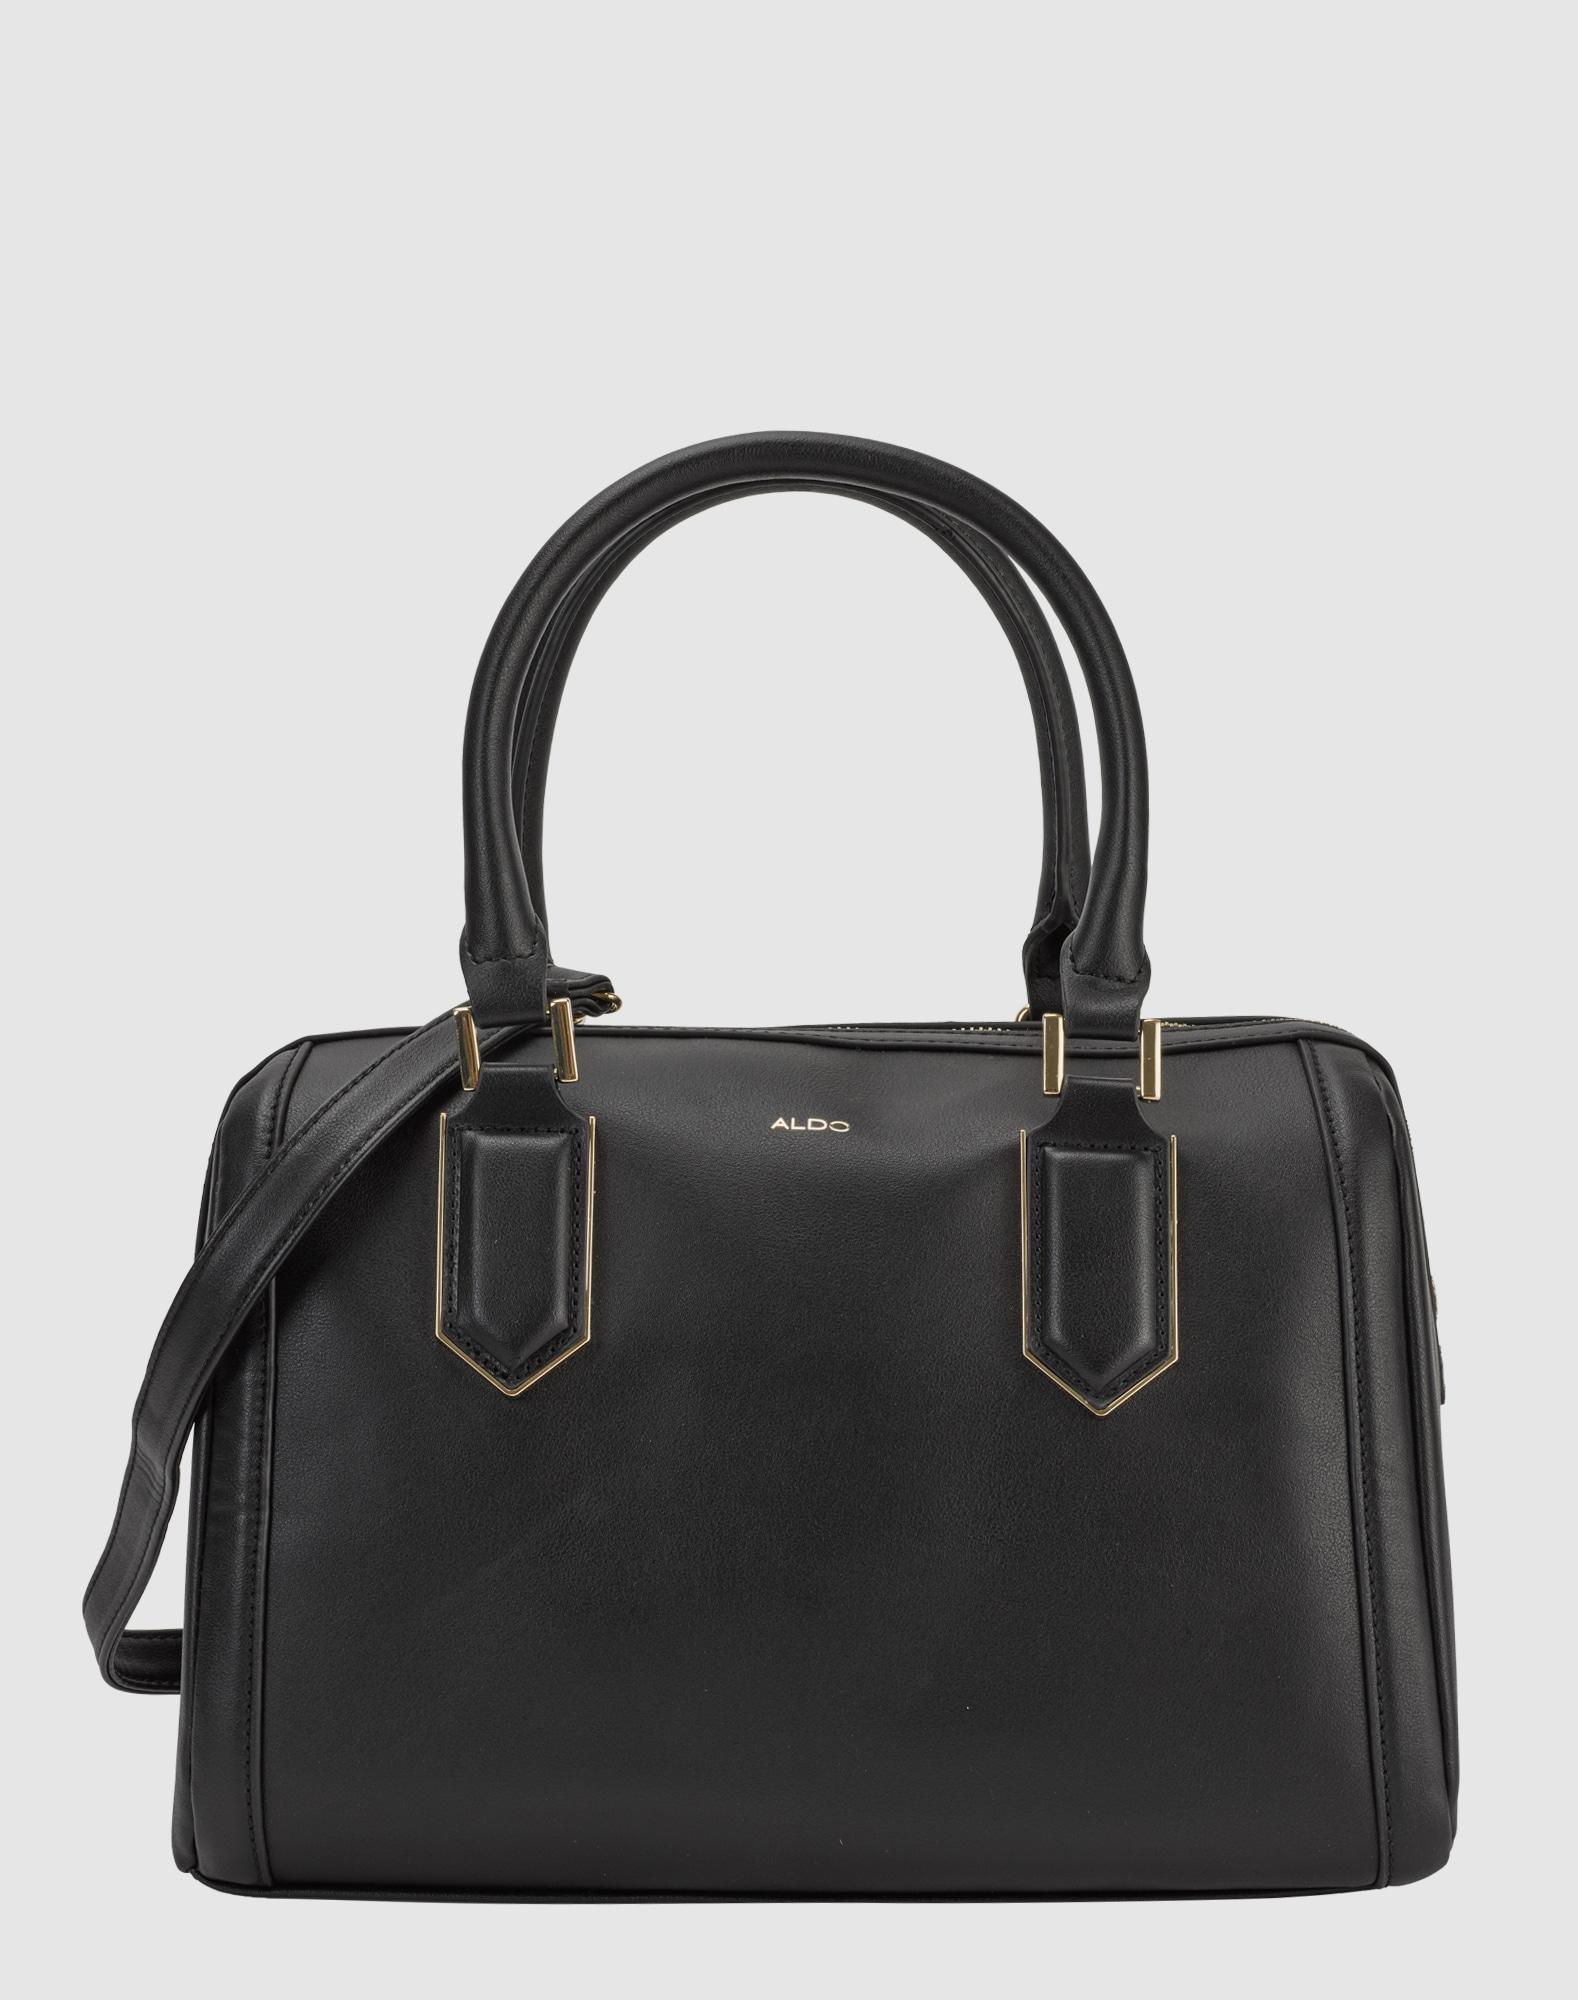 aldo handtasche 39 guevin 39 in schwarz about you. Black Bedroom Furniture Sets. Home Design Ideas